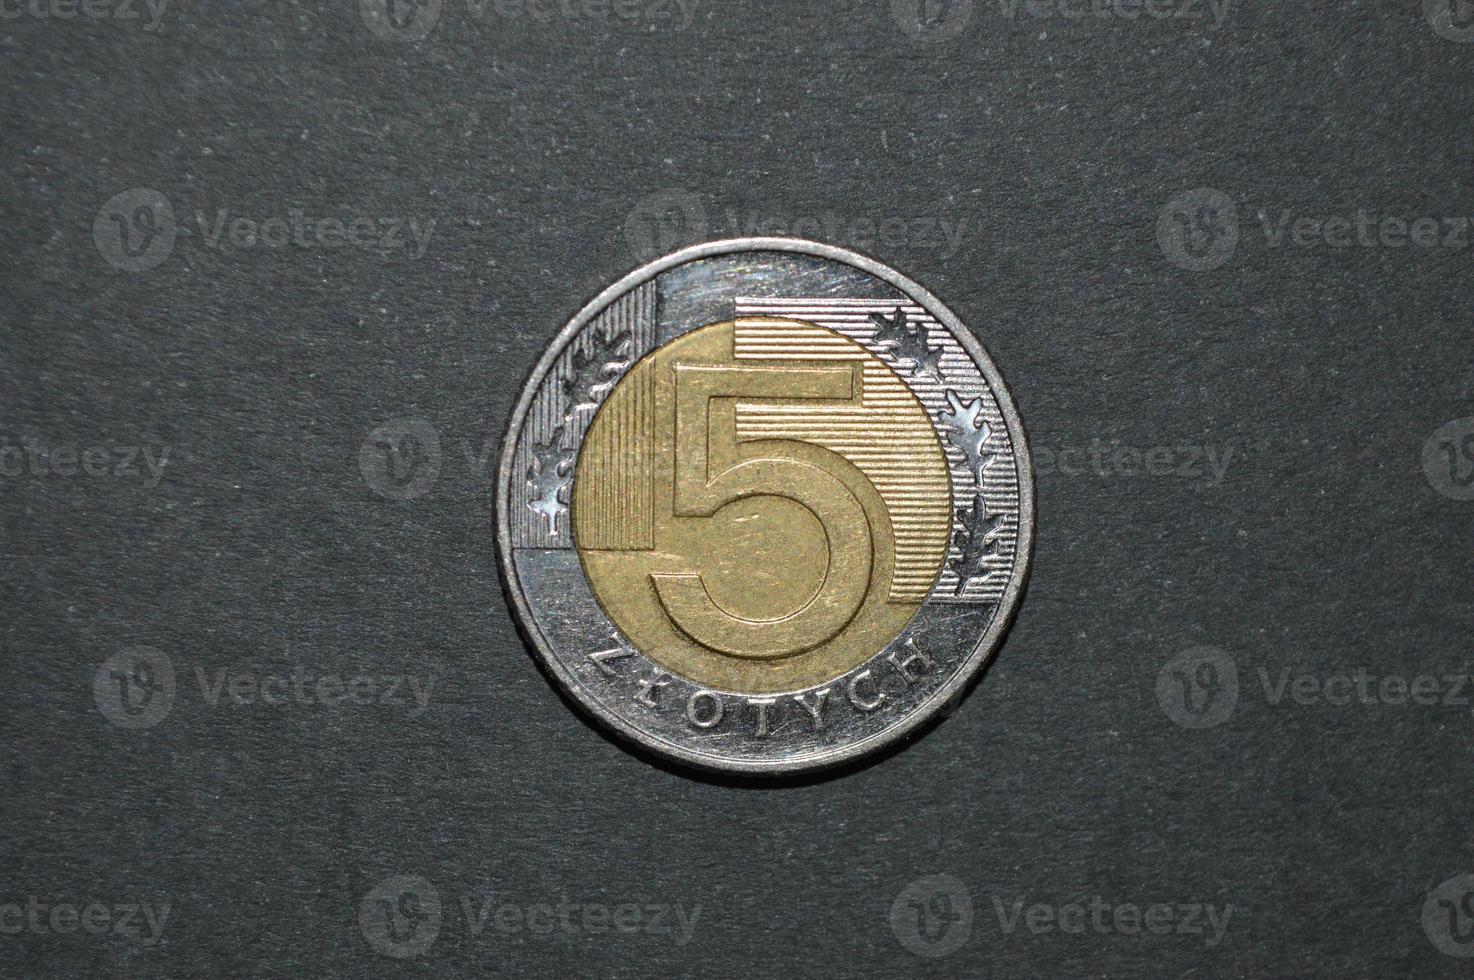 moneta da cinque zloty smalto denaro pln foto